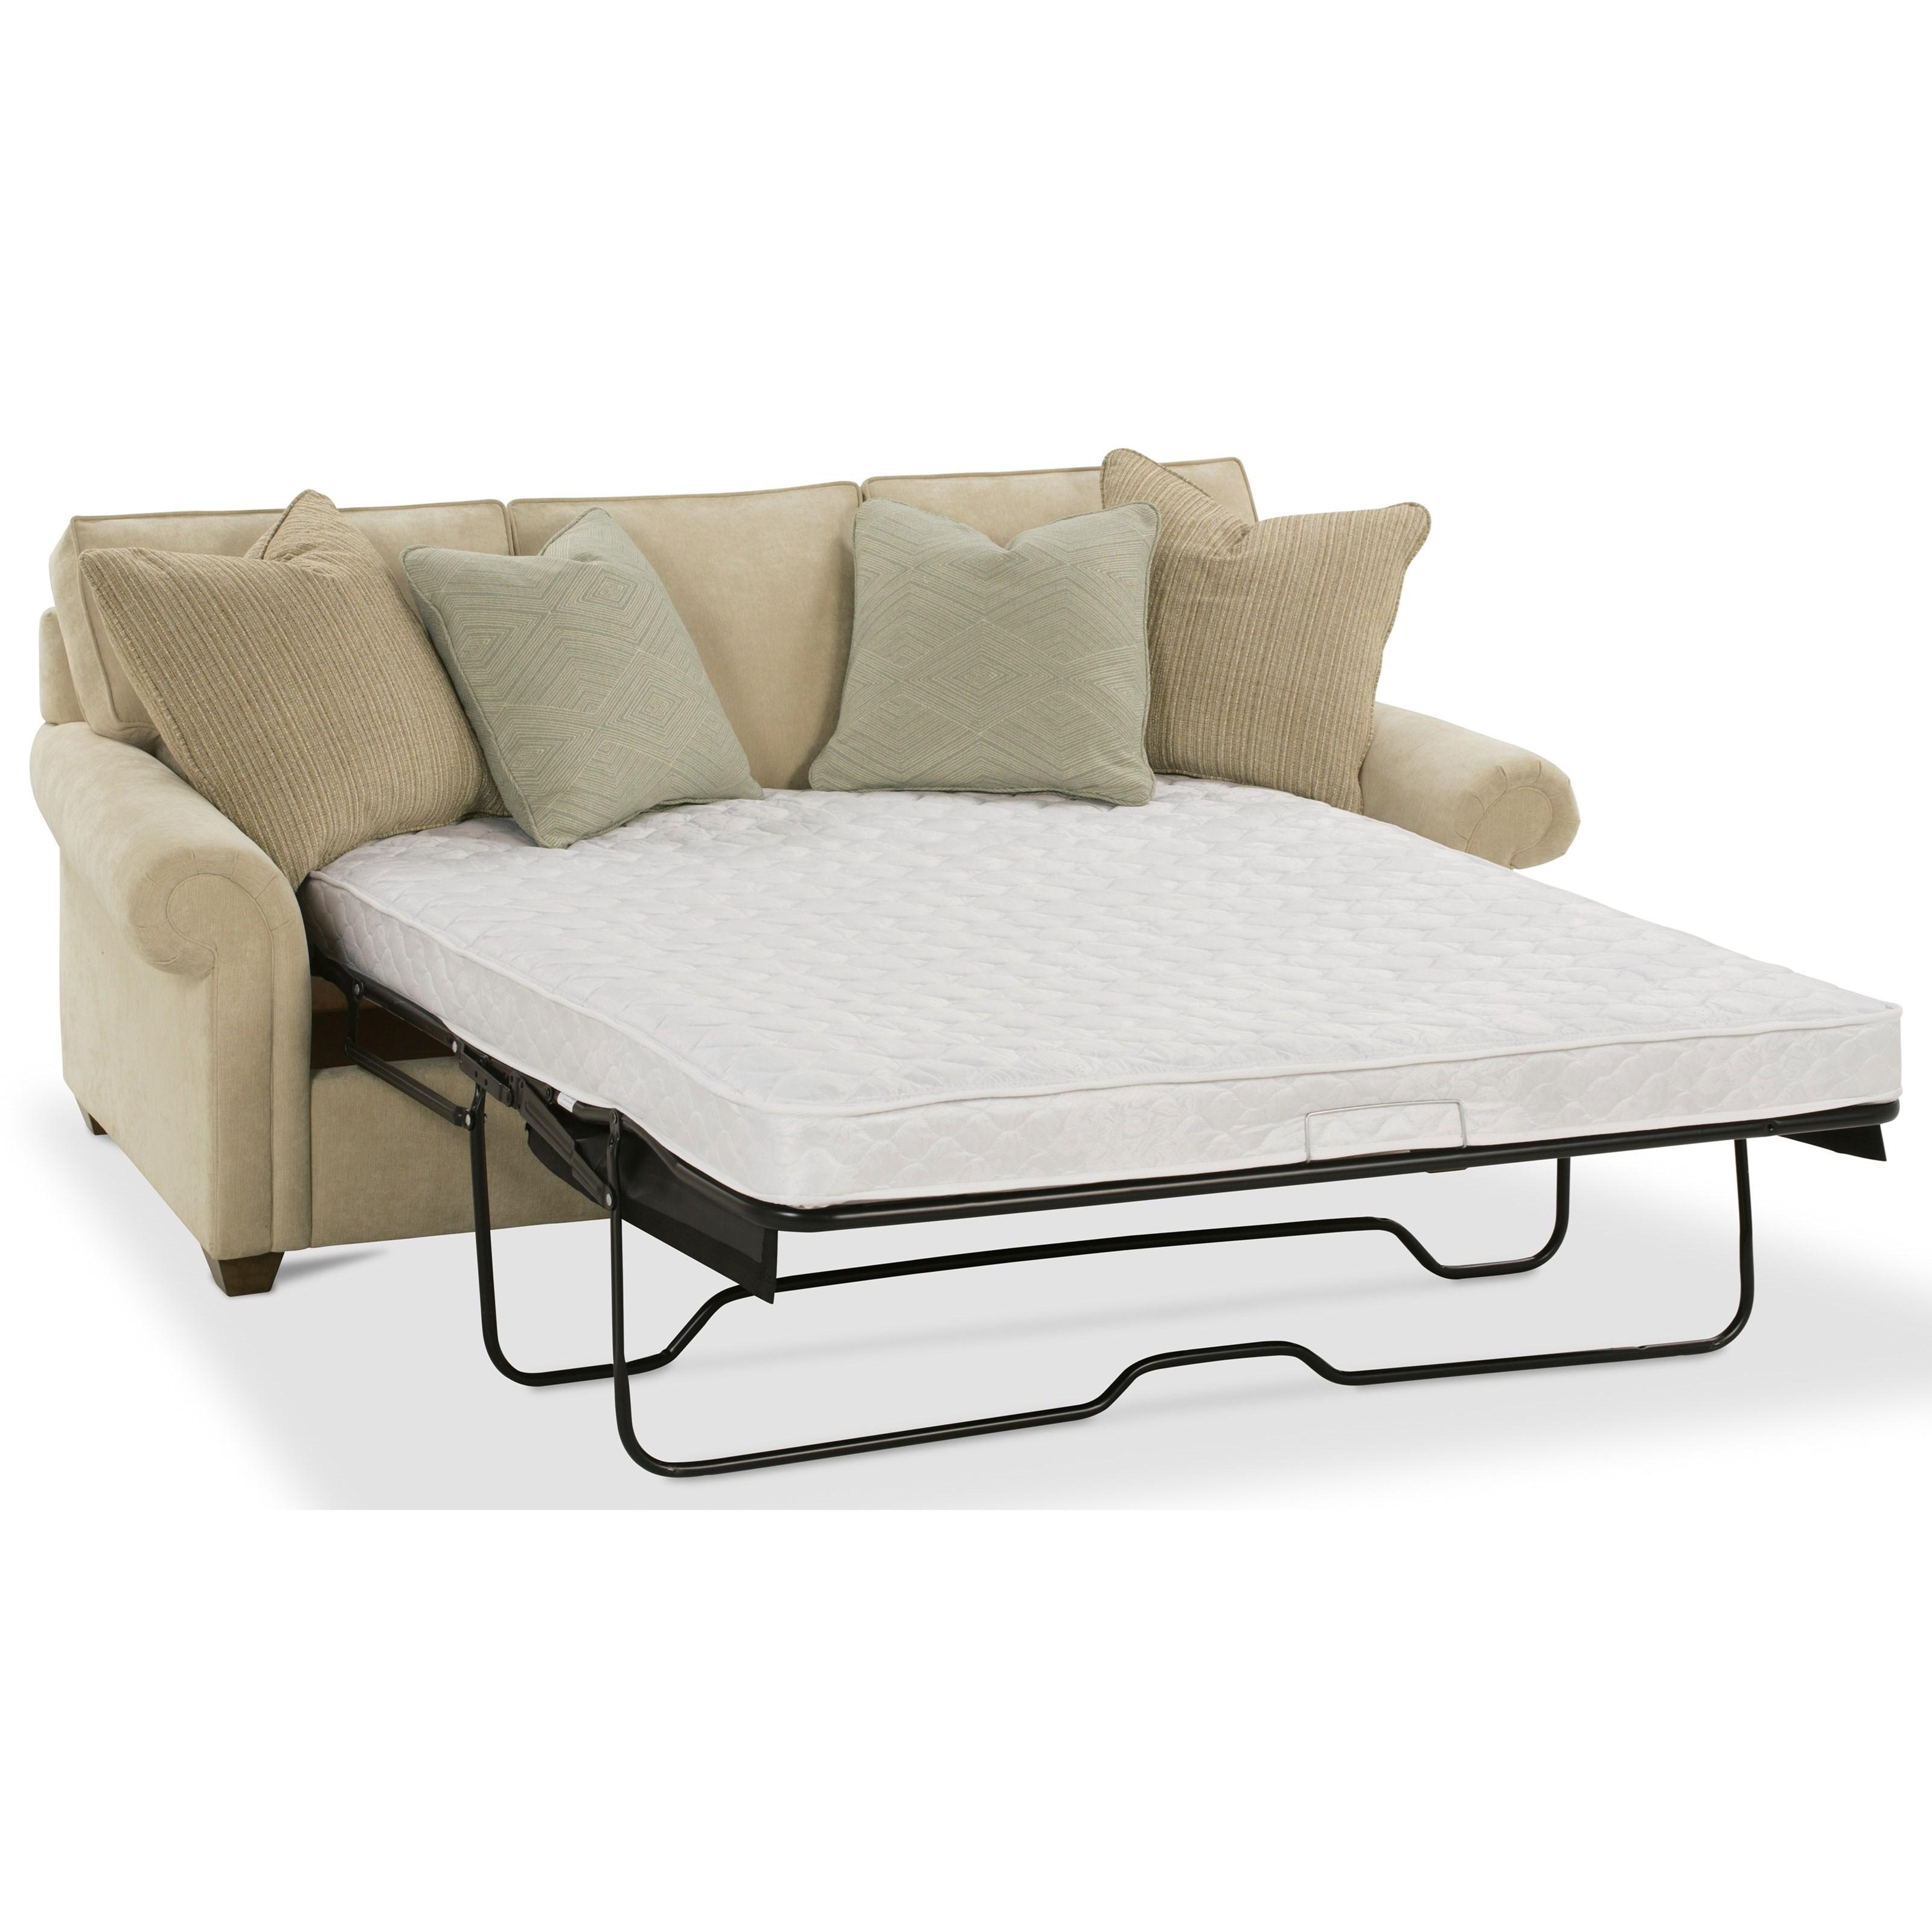 Bon Rowe MorganTraditional Queen Sleeper Sofa ...